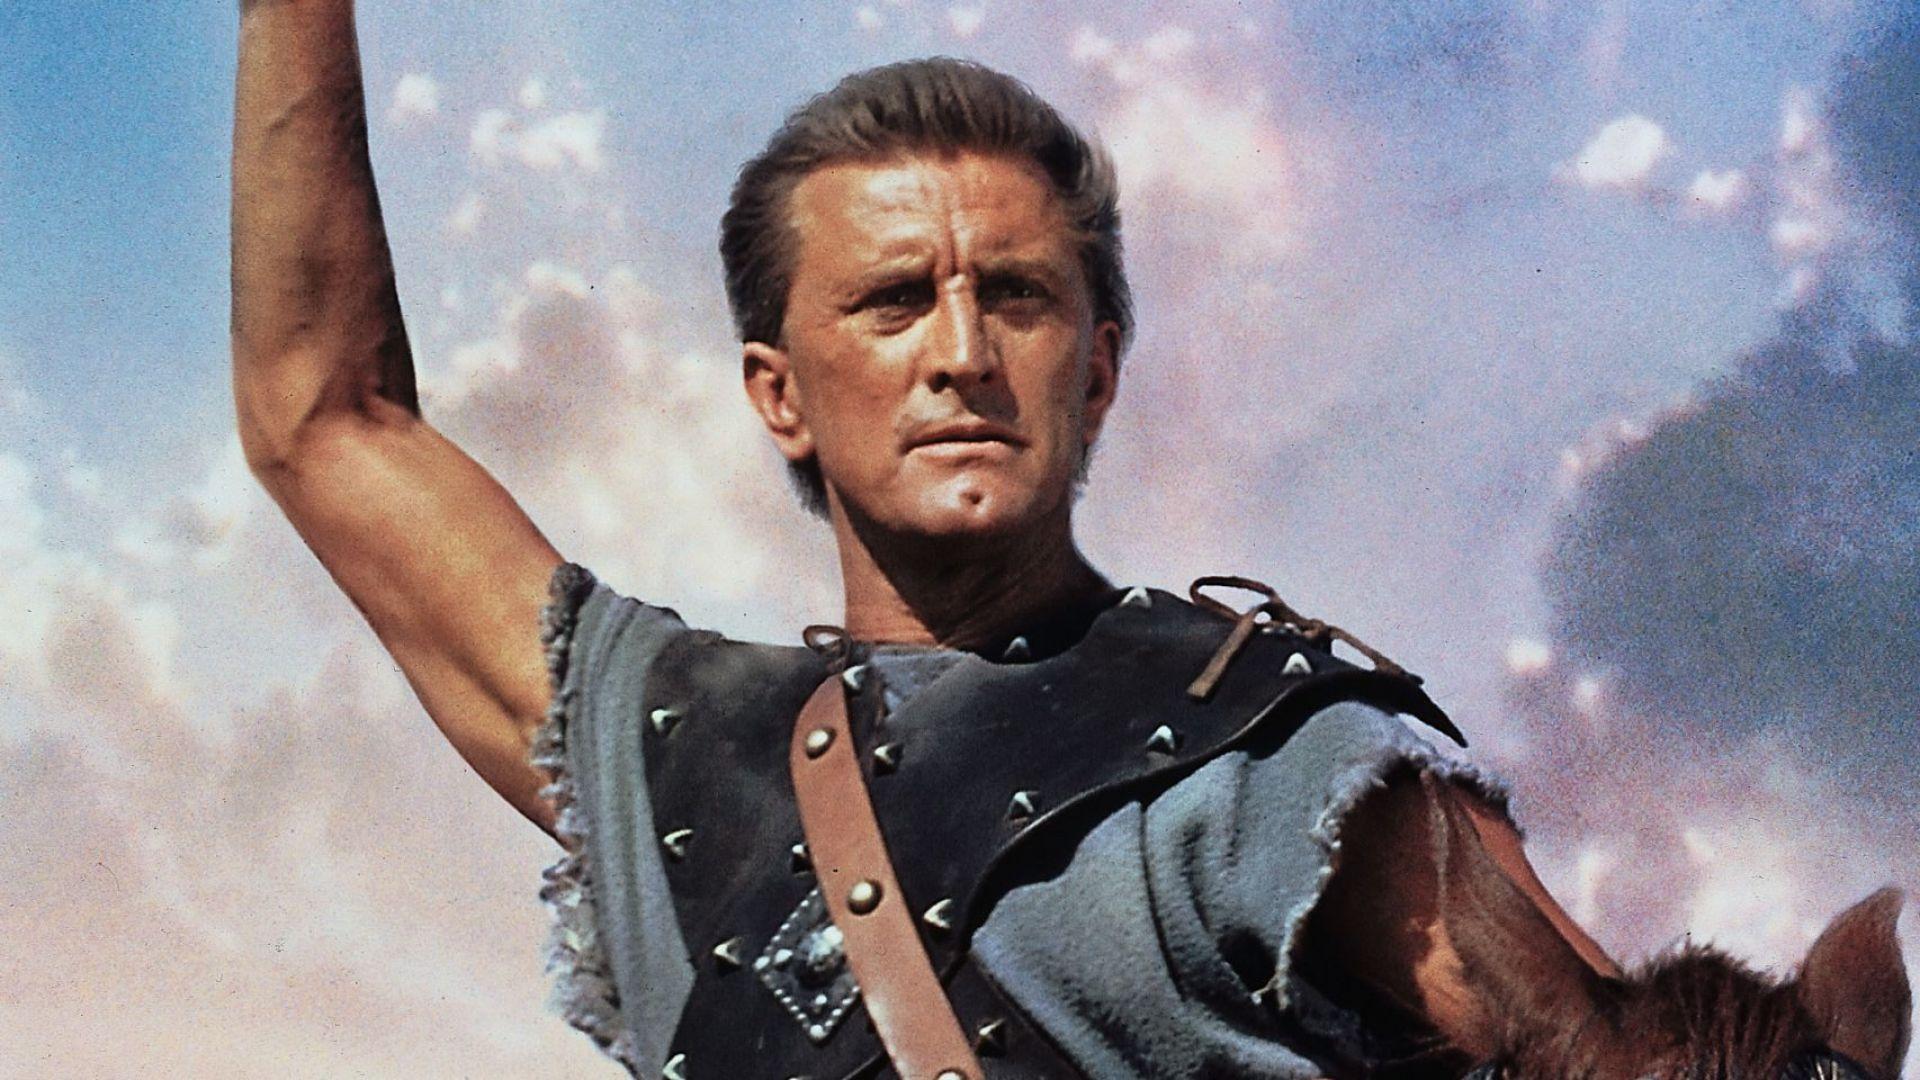 In memoriam за легандата на Холивуд Кърк Дъглас - ключови дати и интересни факти